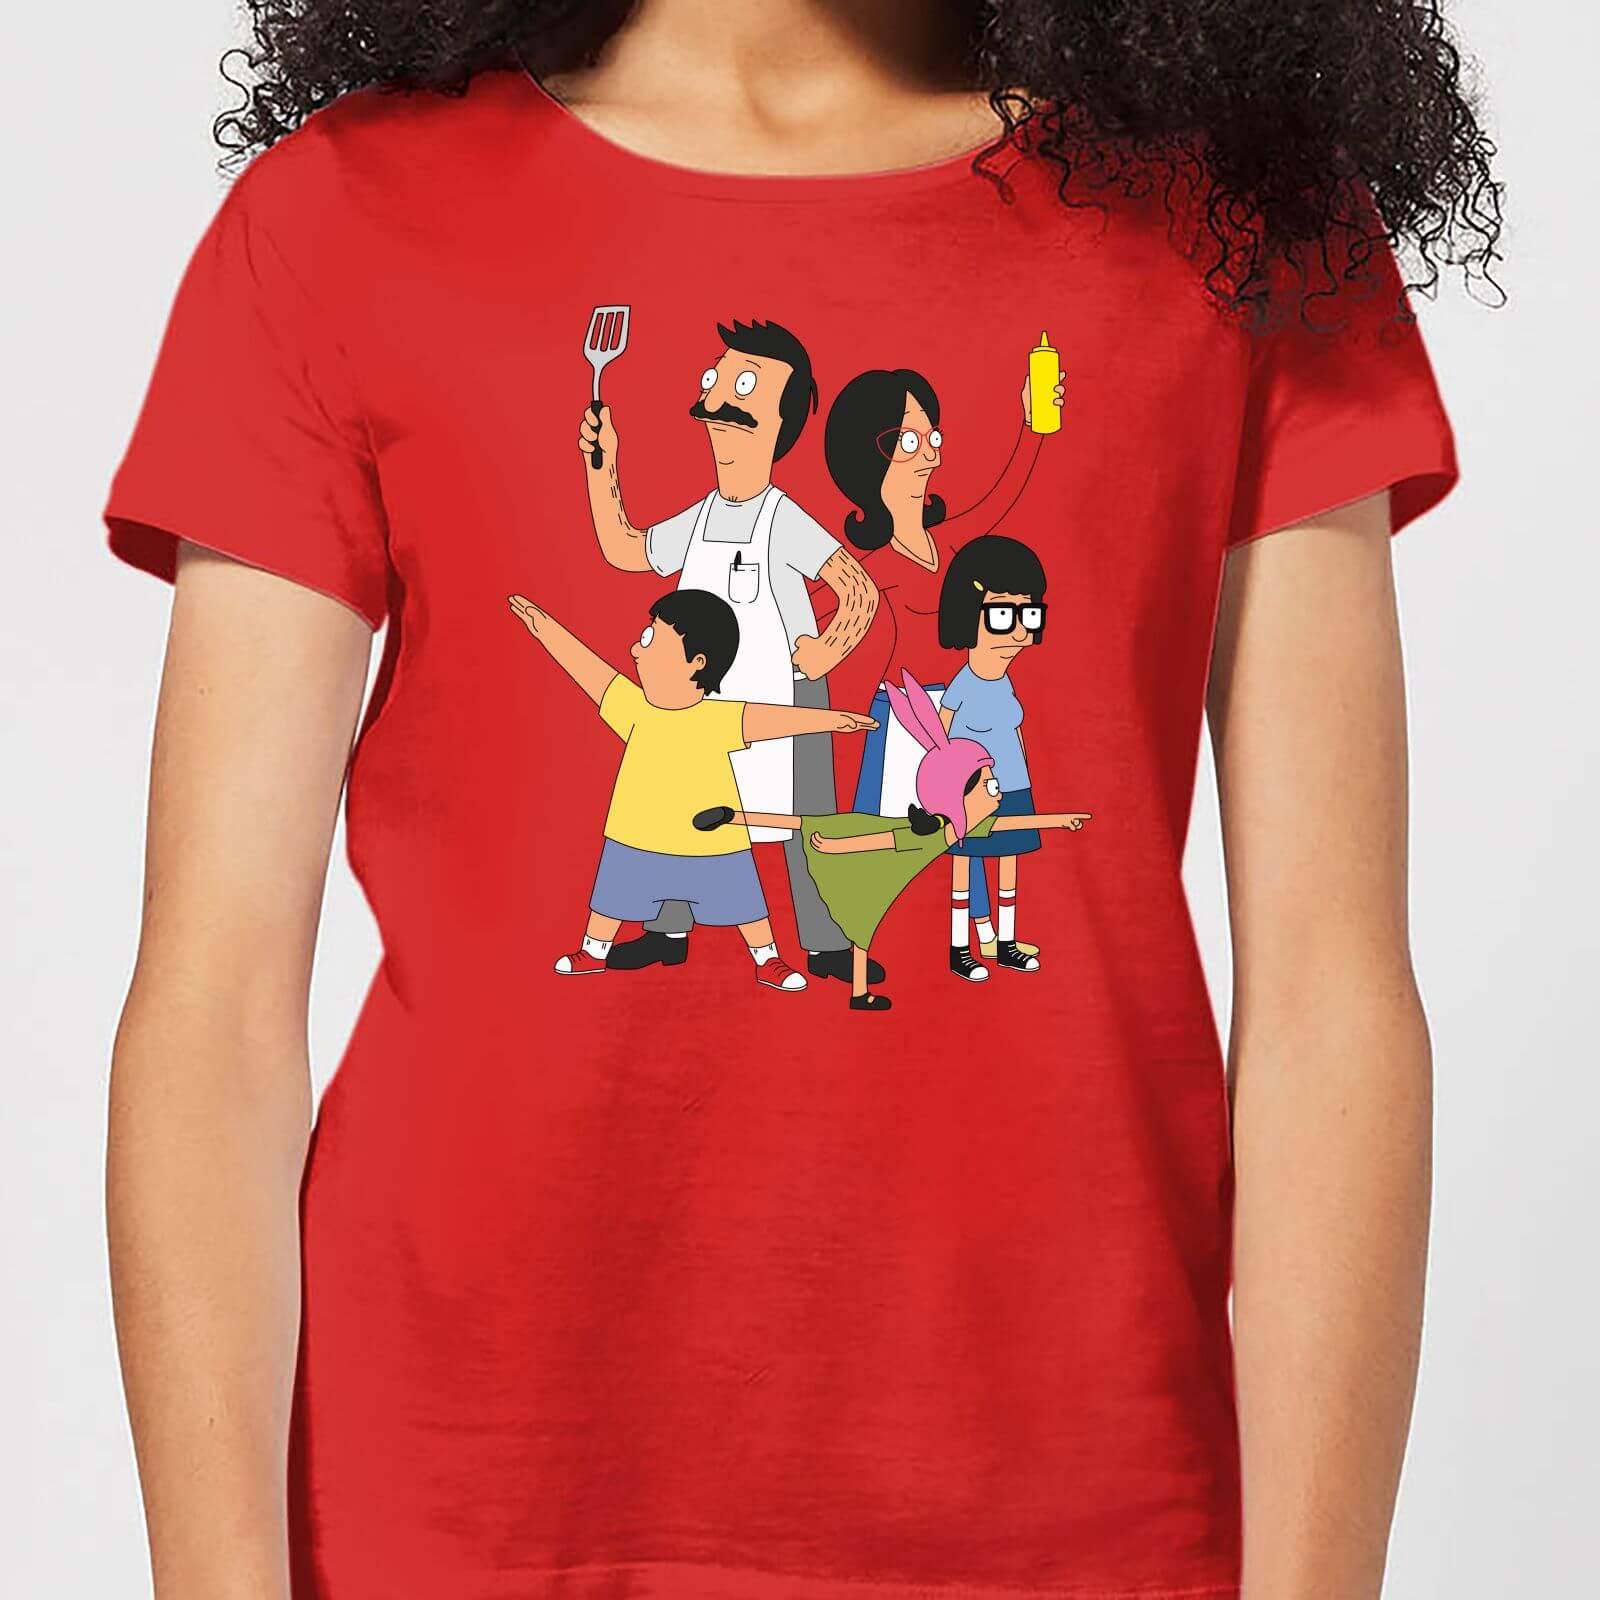 bd96e1c3b Bobs Burgers Family Pose Women's T-Shirt - Red Clothing | Zavvi